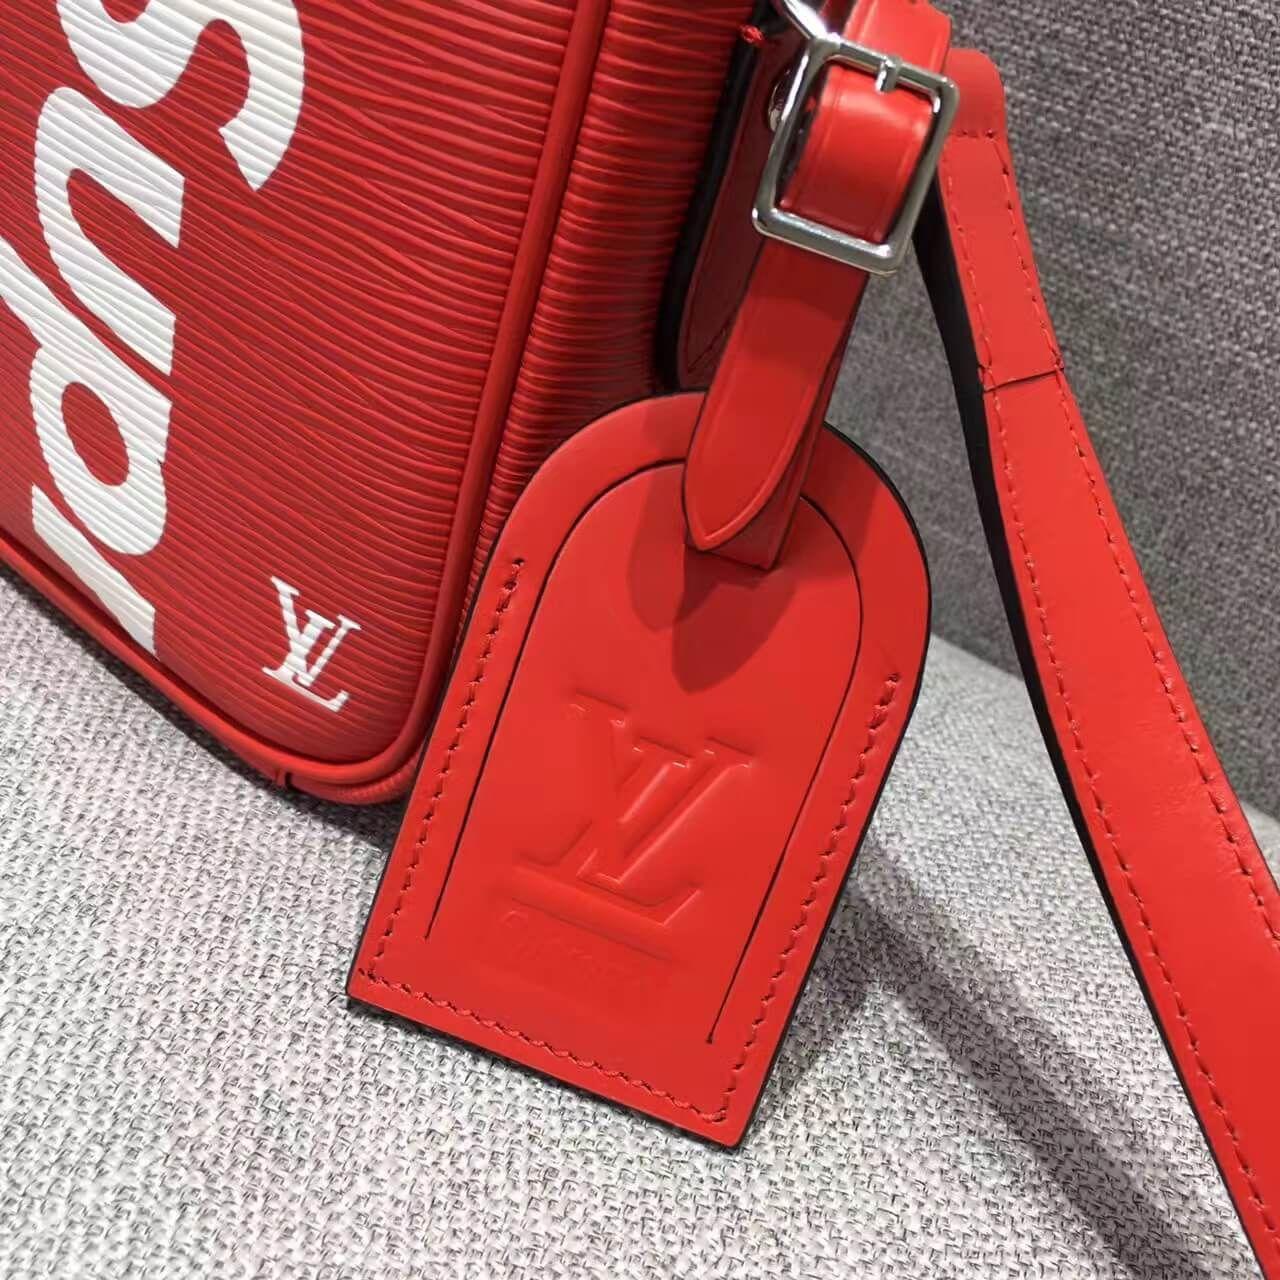 91342f1c5a24 Louis Vuitton x Supreme Epi Leather PM Cross Body Men s Shoulder Bag Red  2017